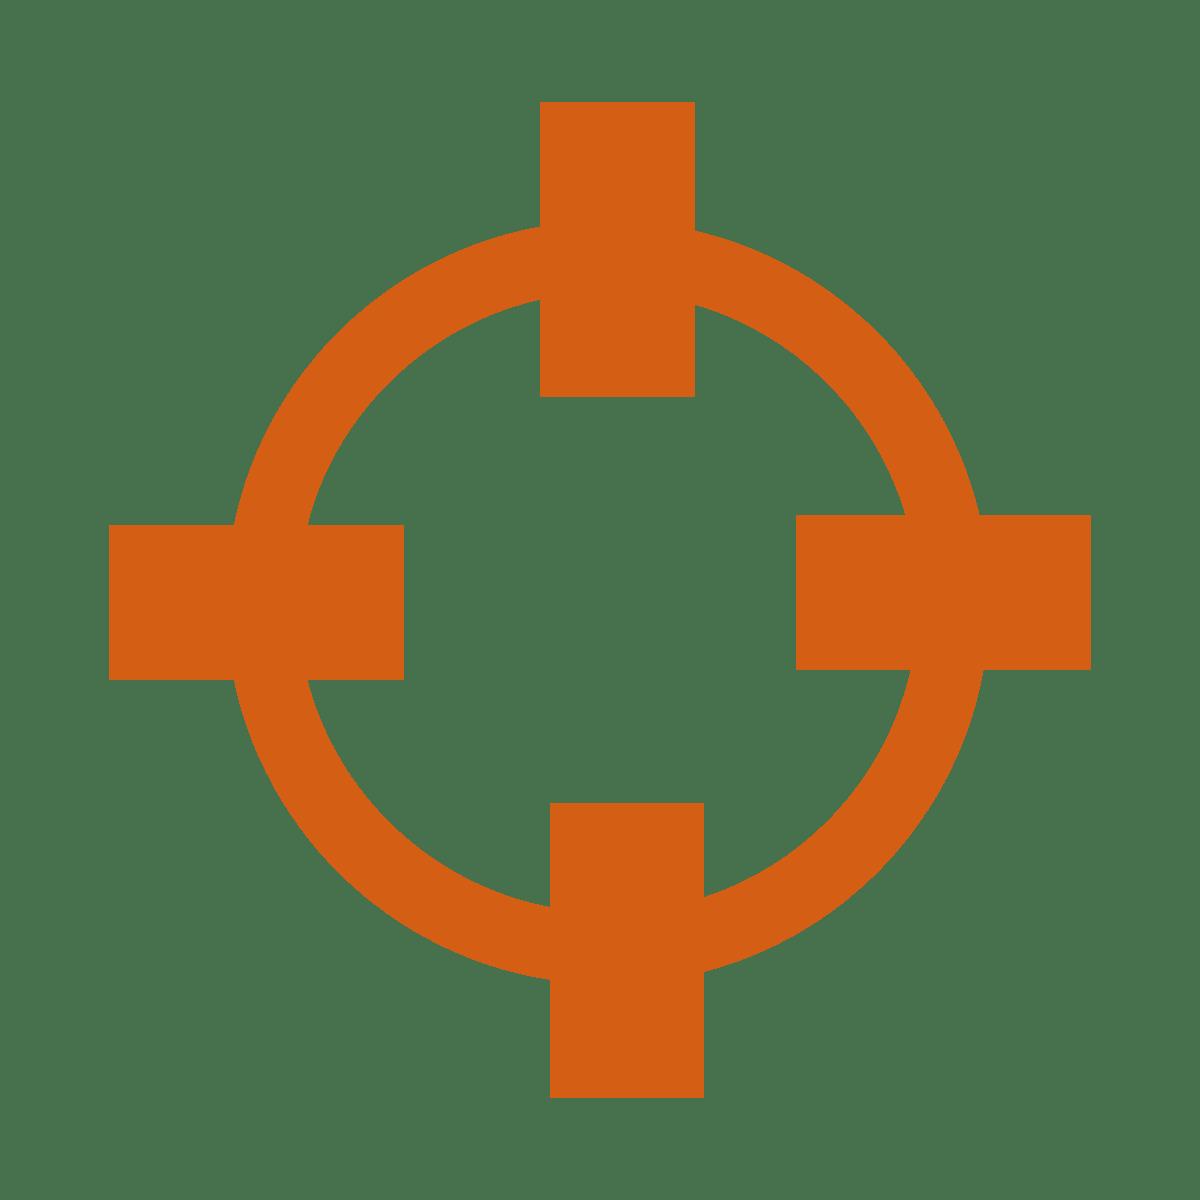 arvense-group-5f-methodology-step-3-focus-orange